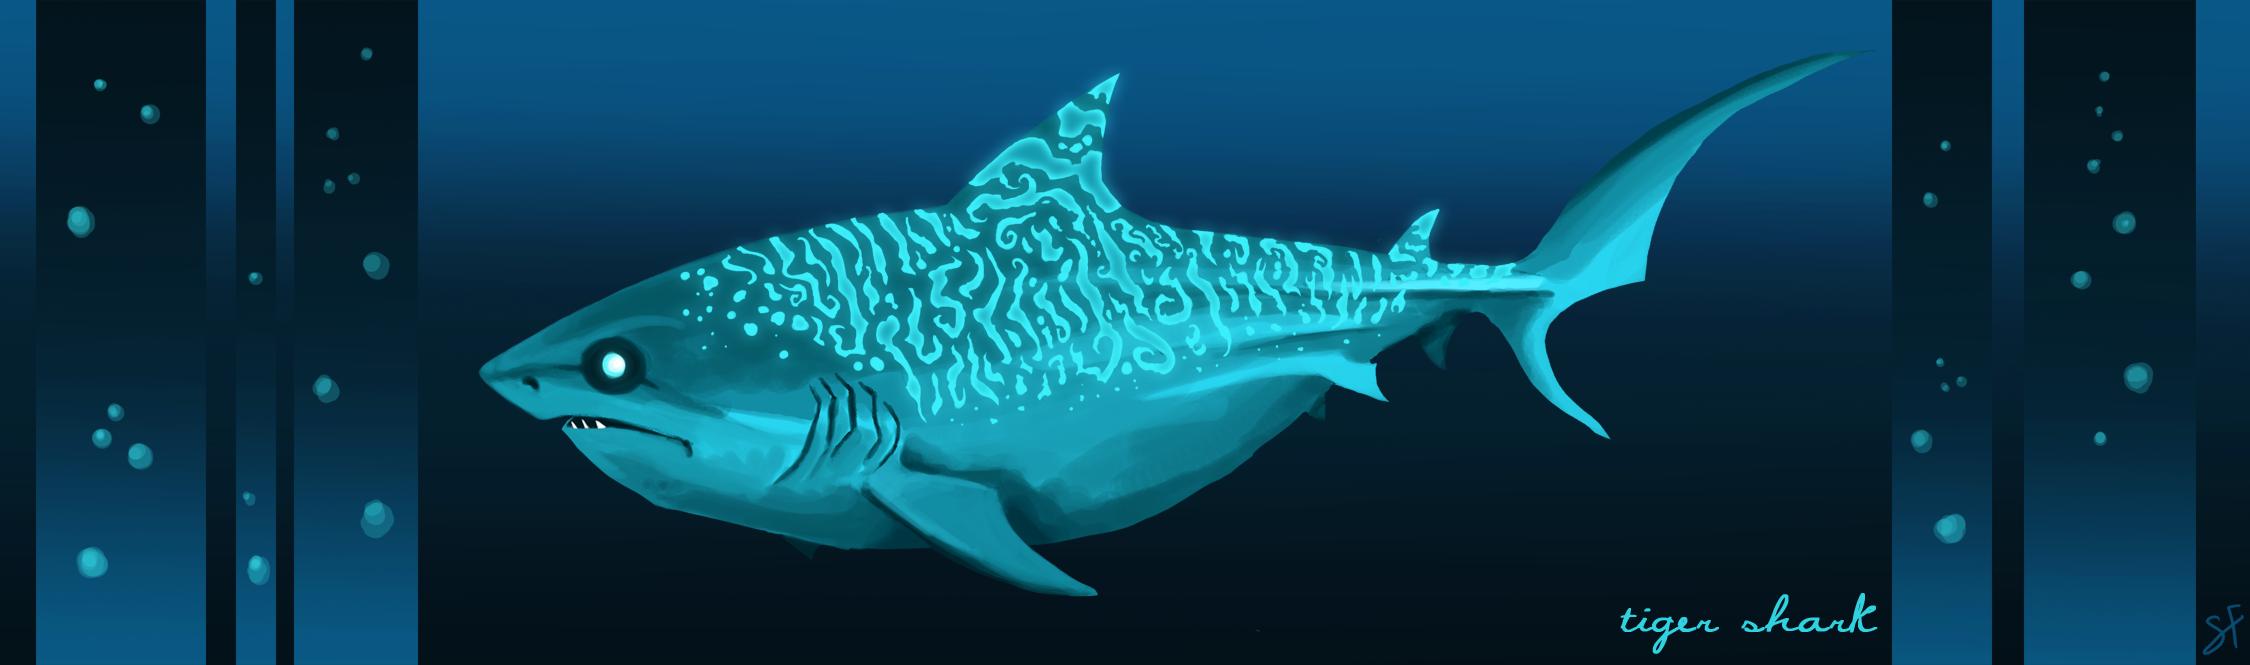 Shark Week Day 1 By Tea Tiger On Deviantart Eye Diagram Brittlebear Love Gallery